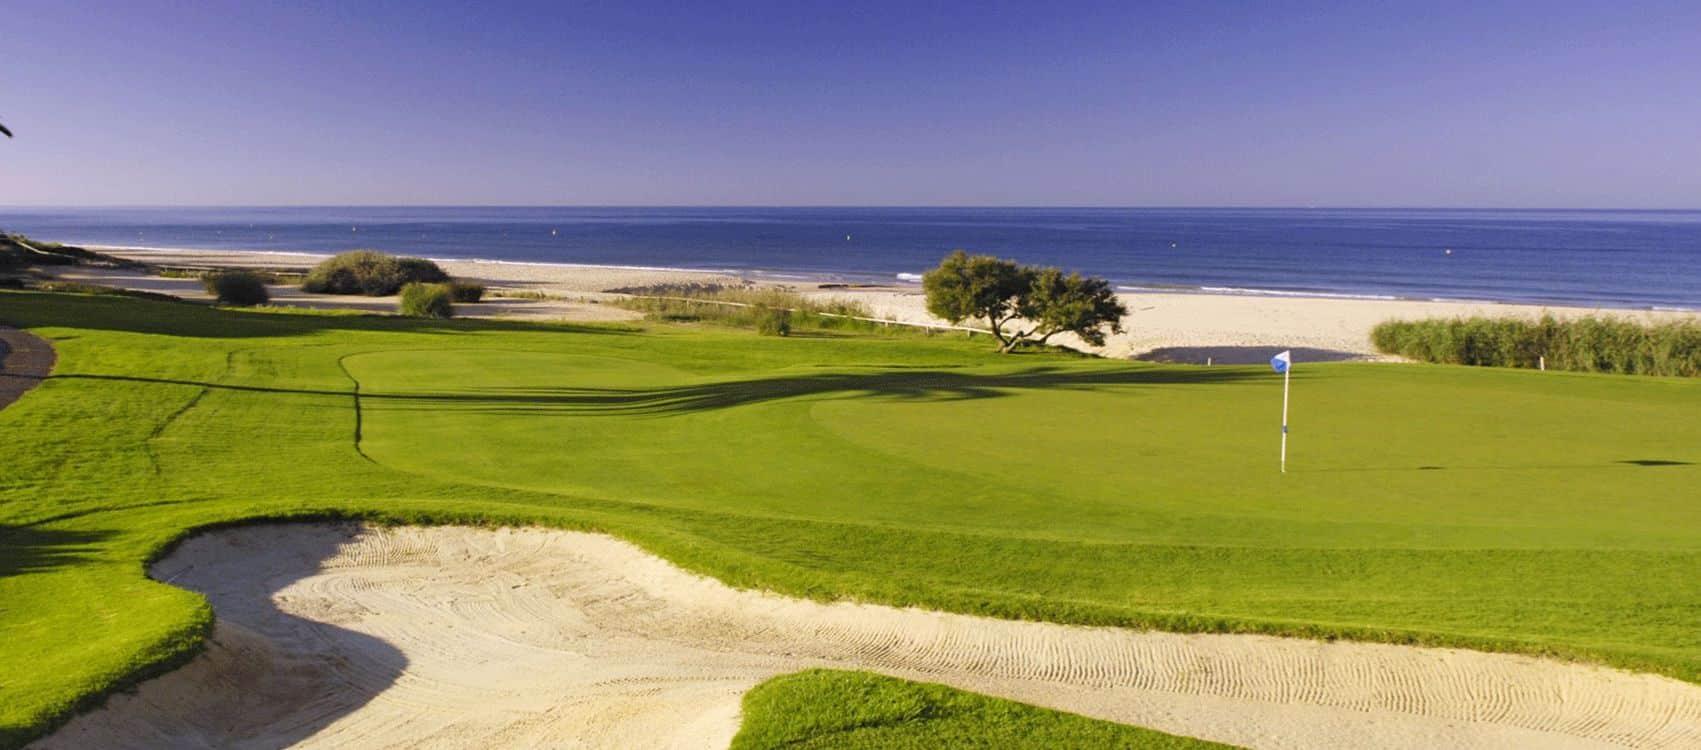 vale-de-lobo-ocean-golf-course-2